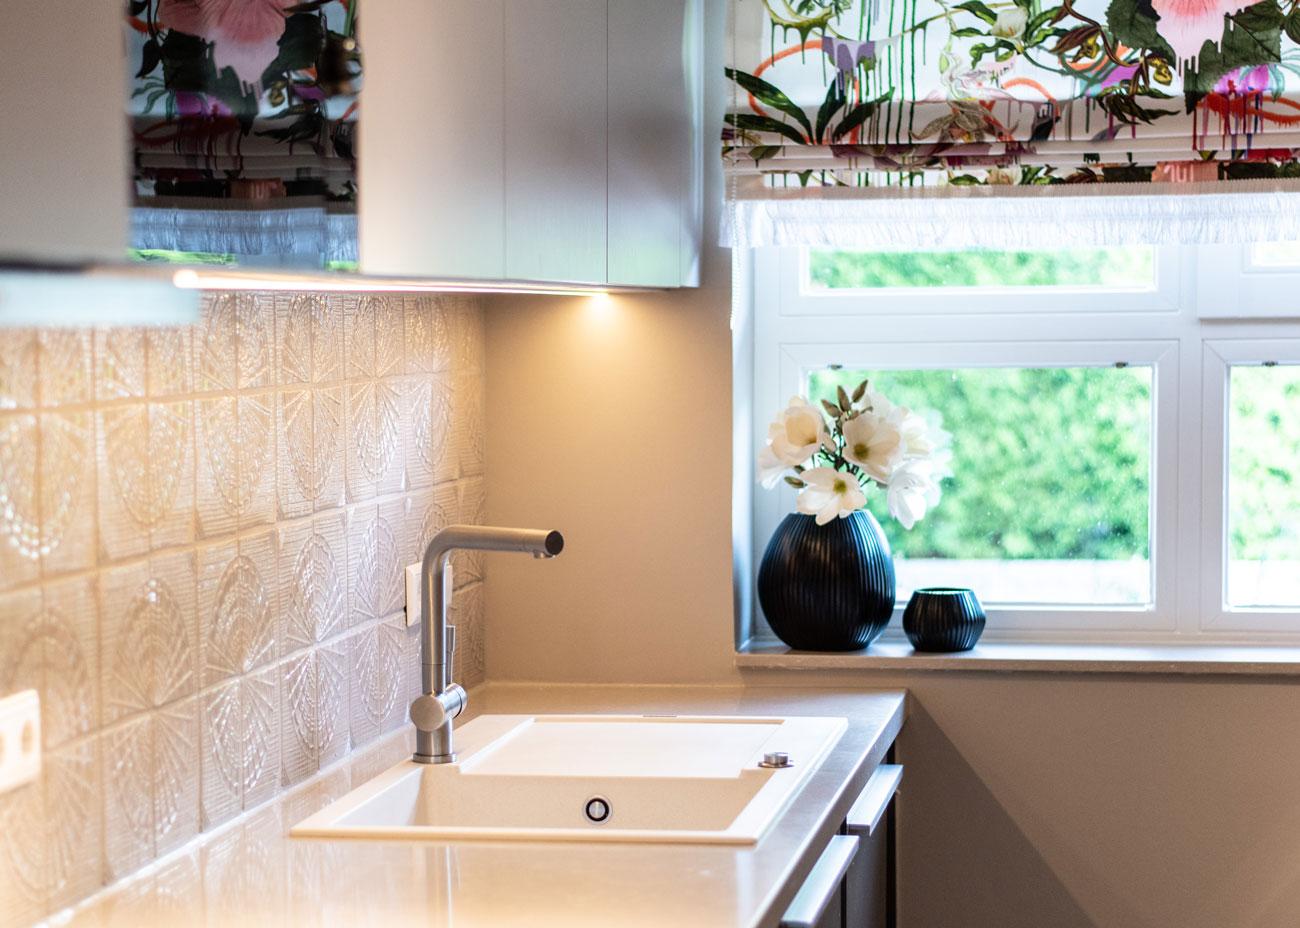 Haus renovieren Ideen   Elegantes Interior Design Konzept ...